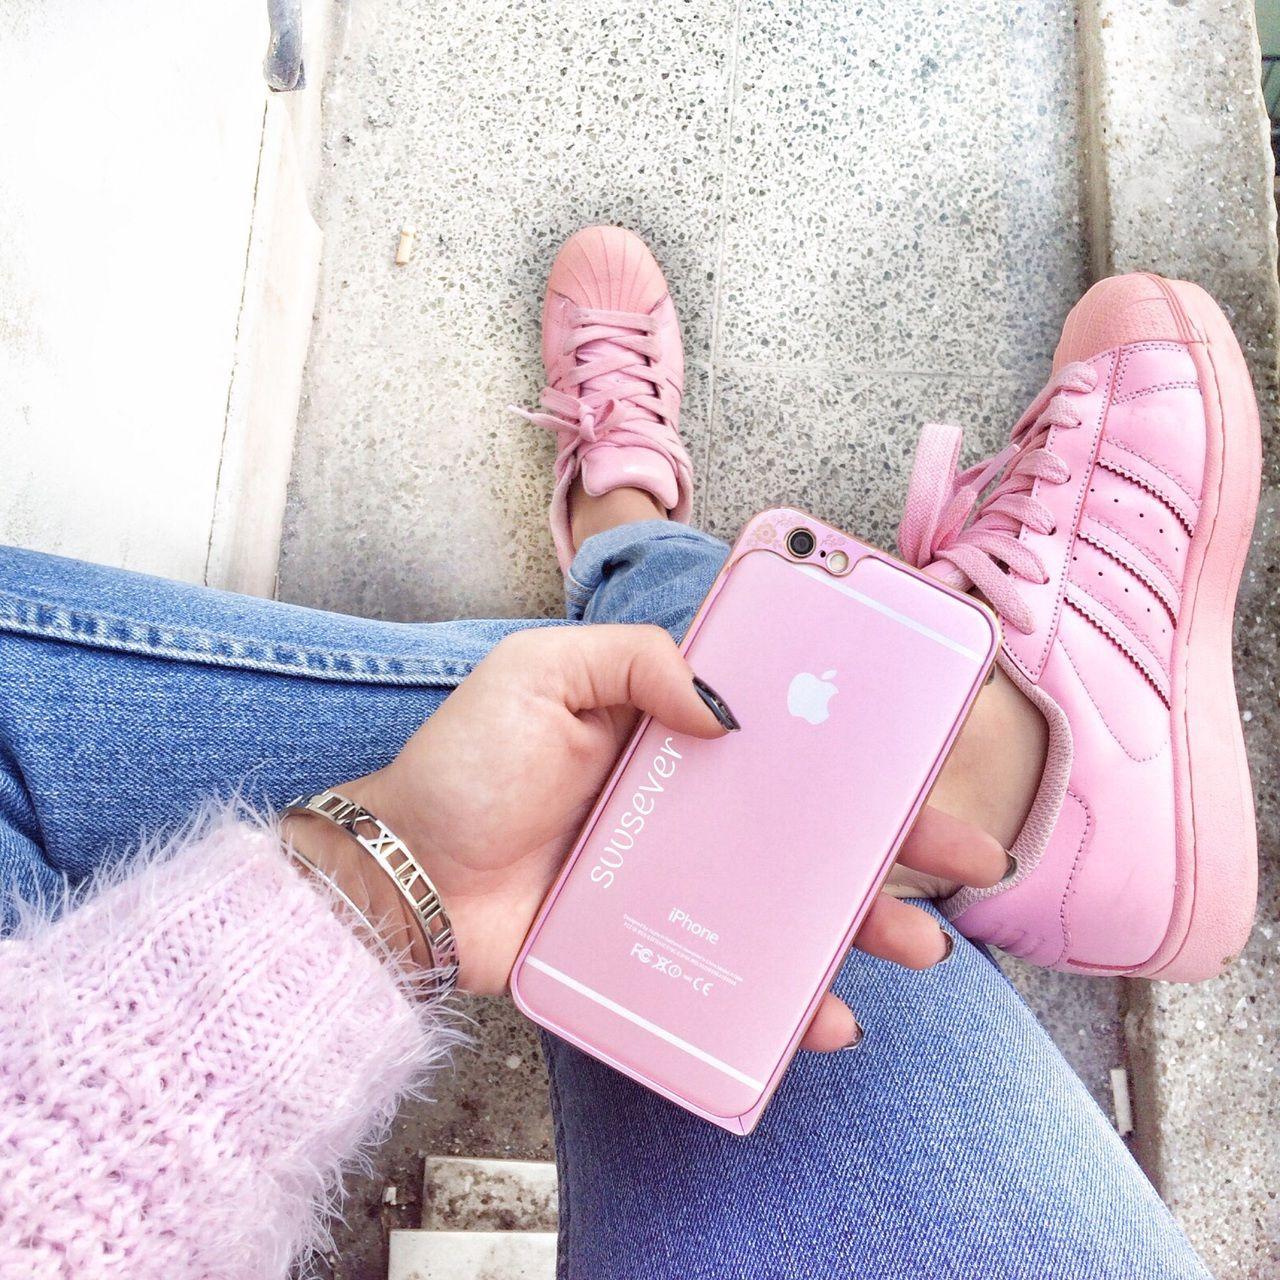 info for b8d7b 2820d pies de mujer con tenis adidas superstar rosa